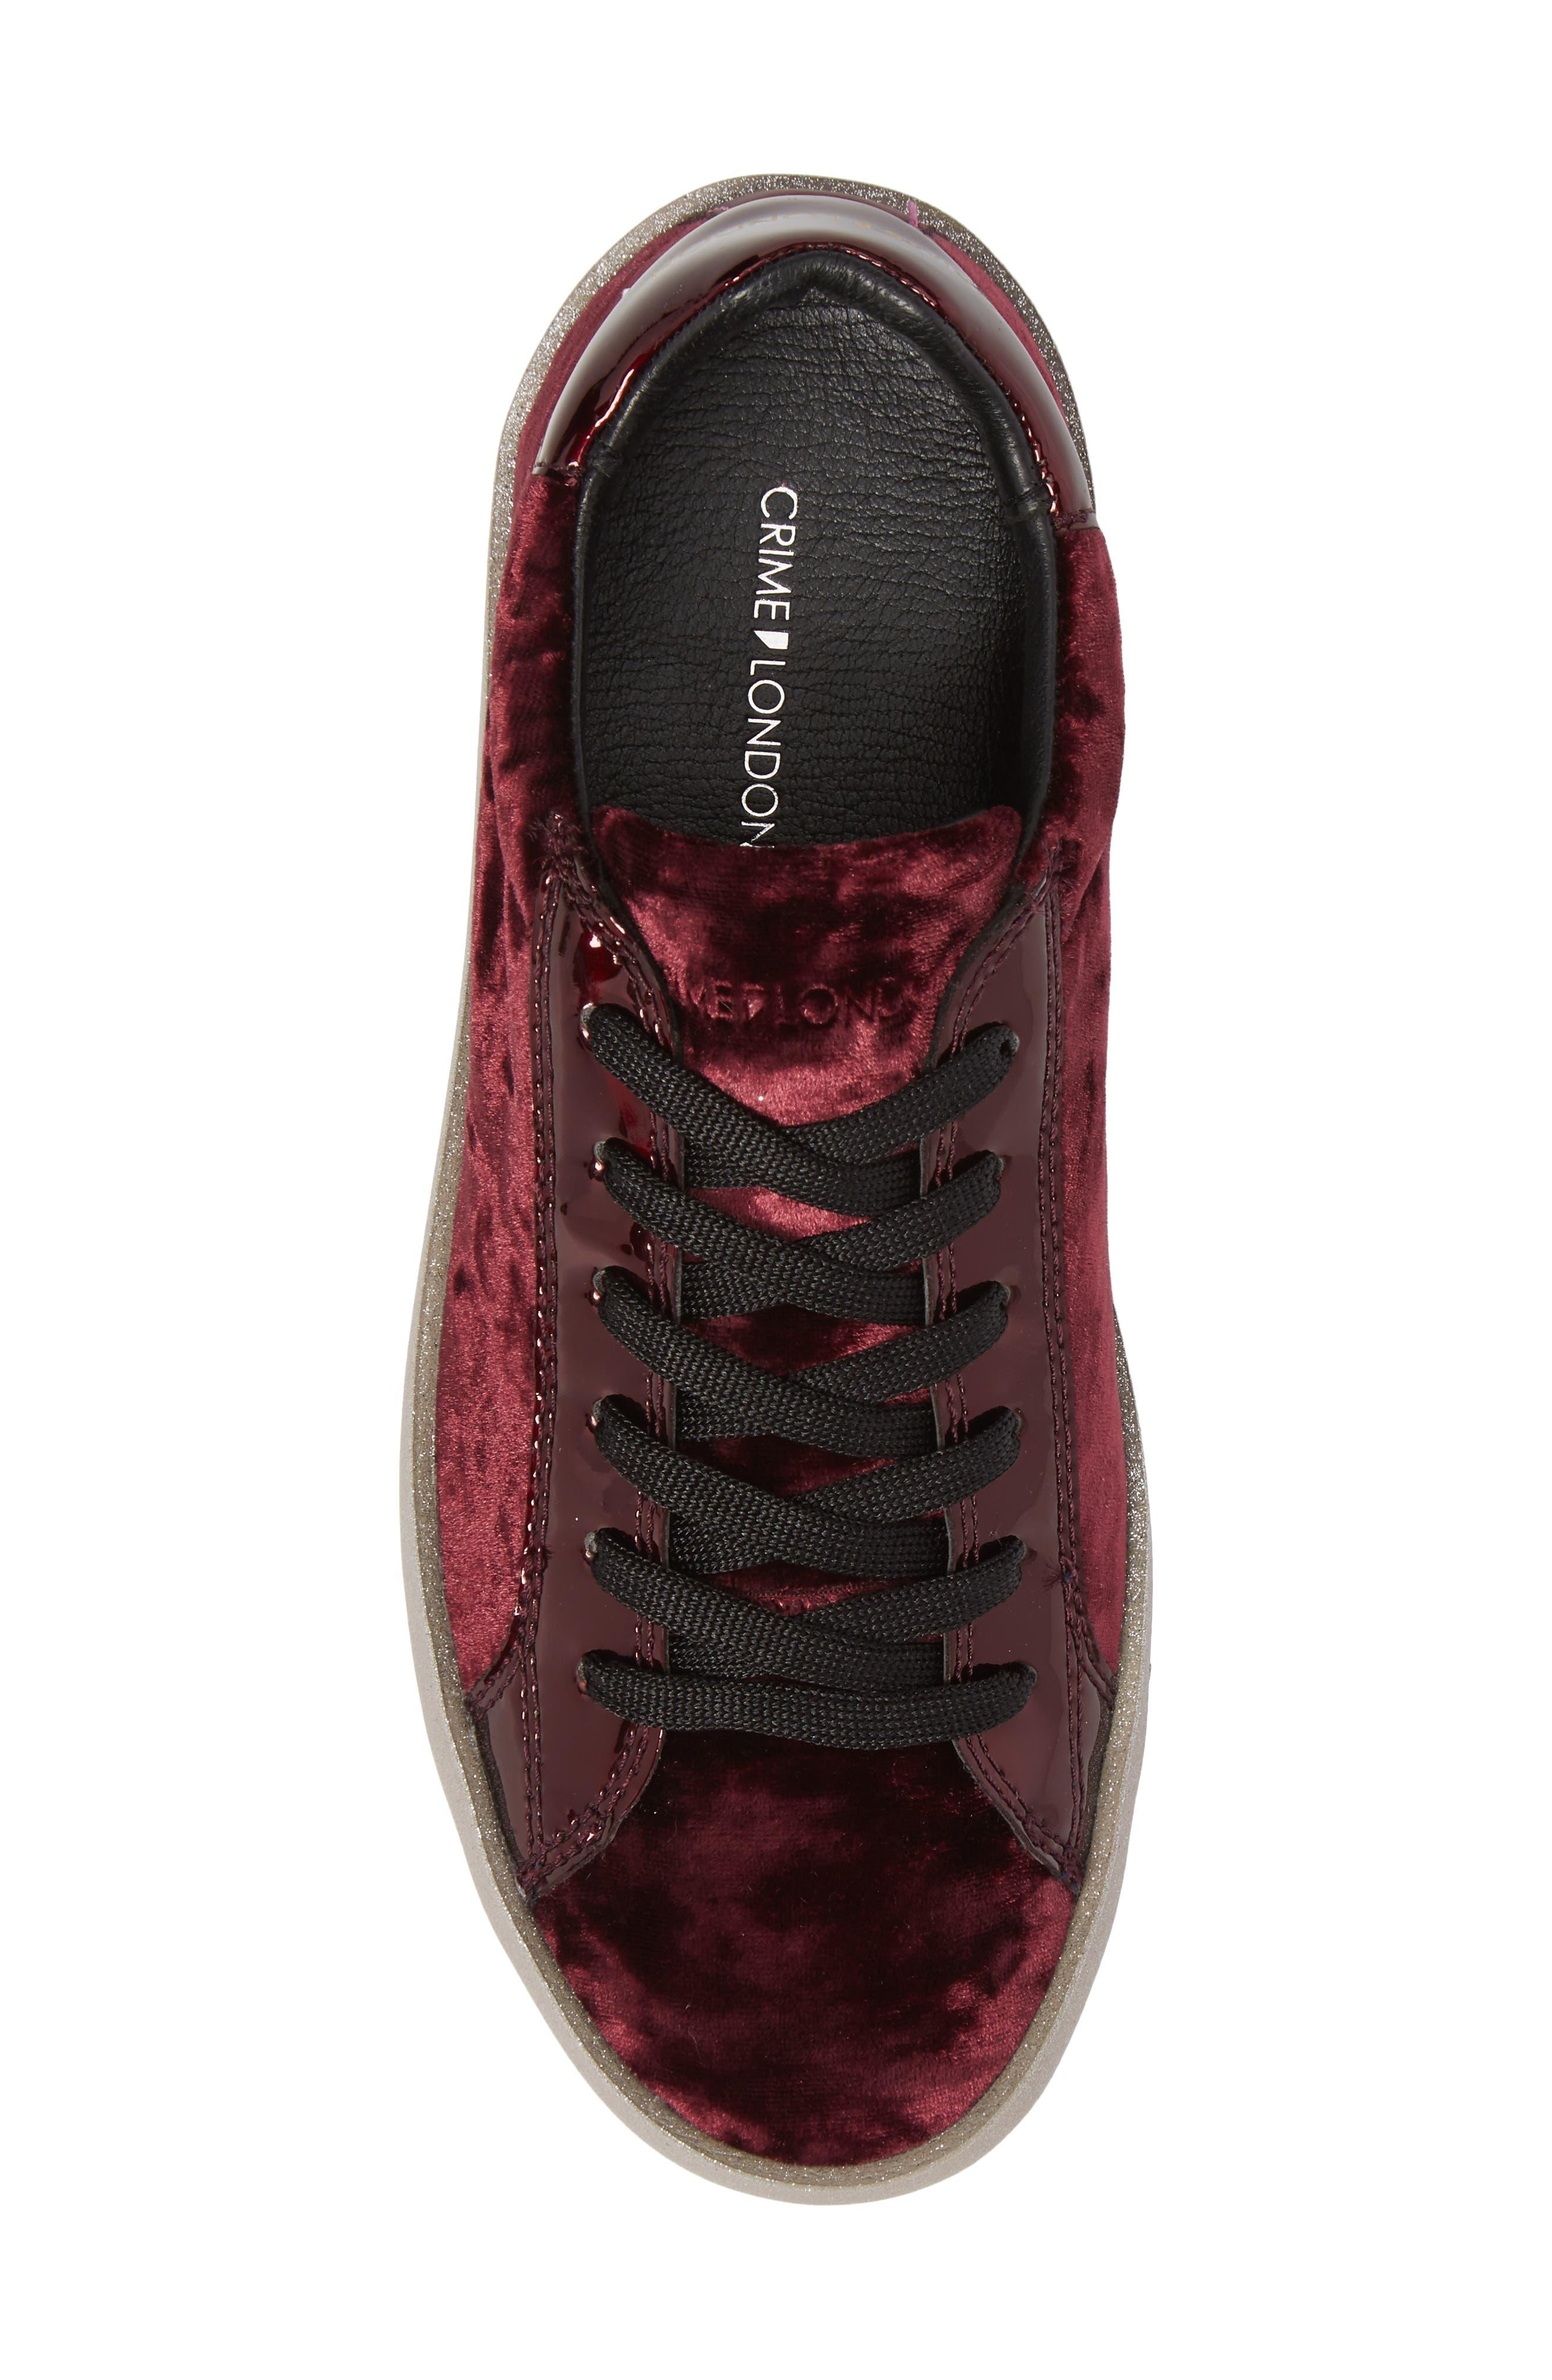 Dynamite Sneaker,                             Alternate thumbnail 5, color,                             Burgundy